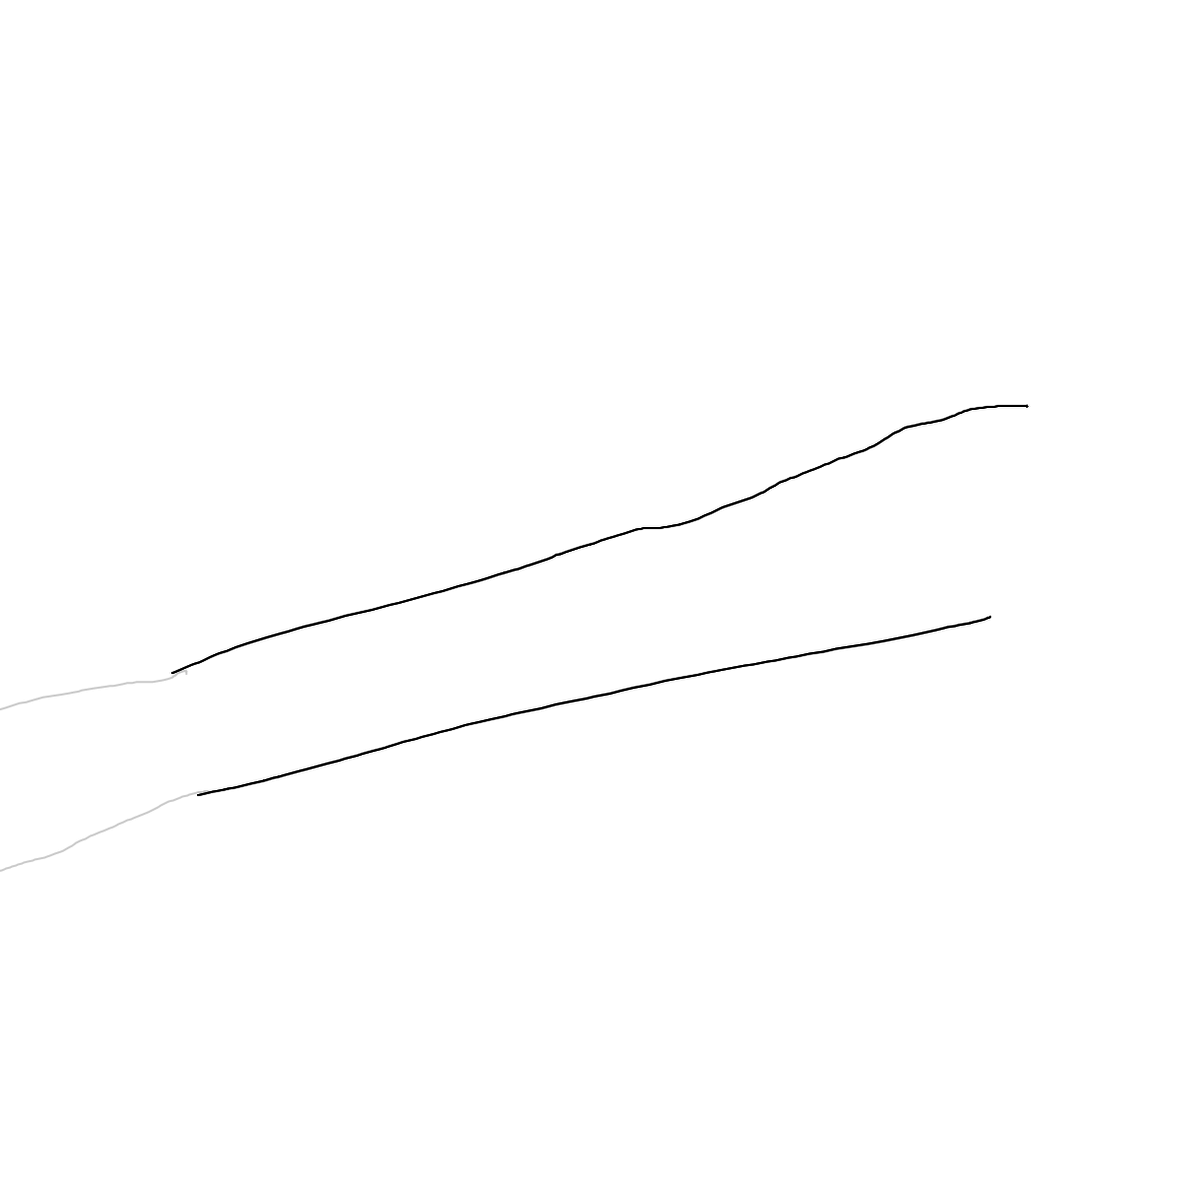 BAAAM drawing#23371 lat:41.9478263854980500lng: -87.6557235717773400